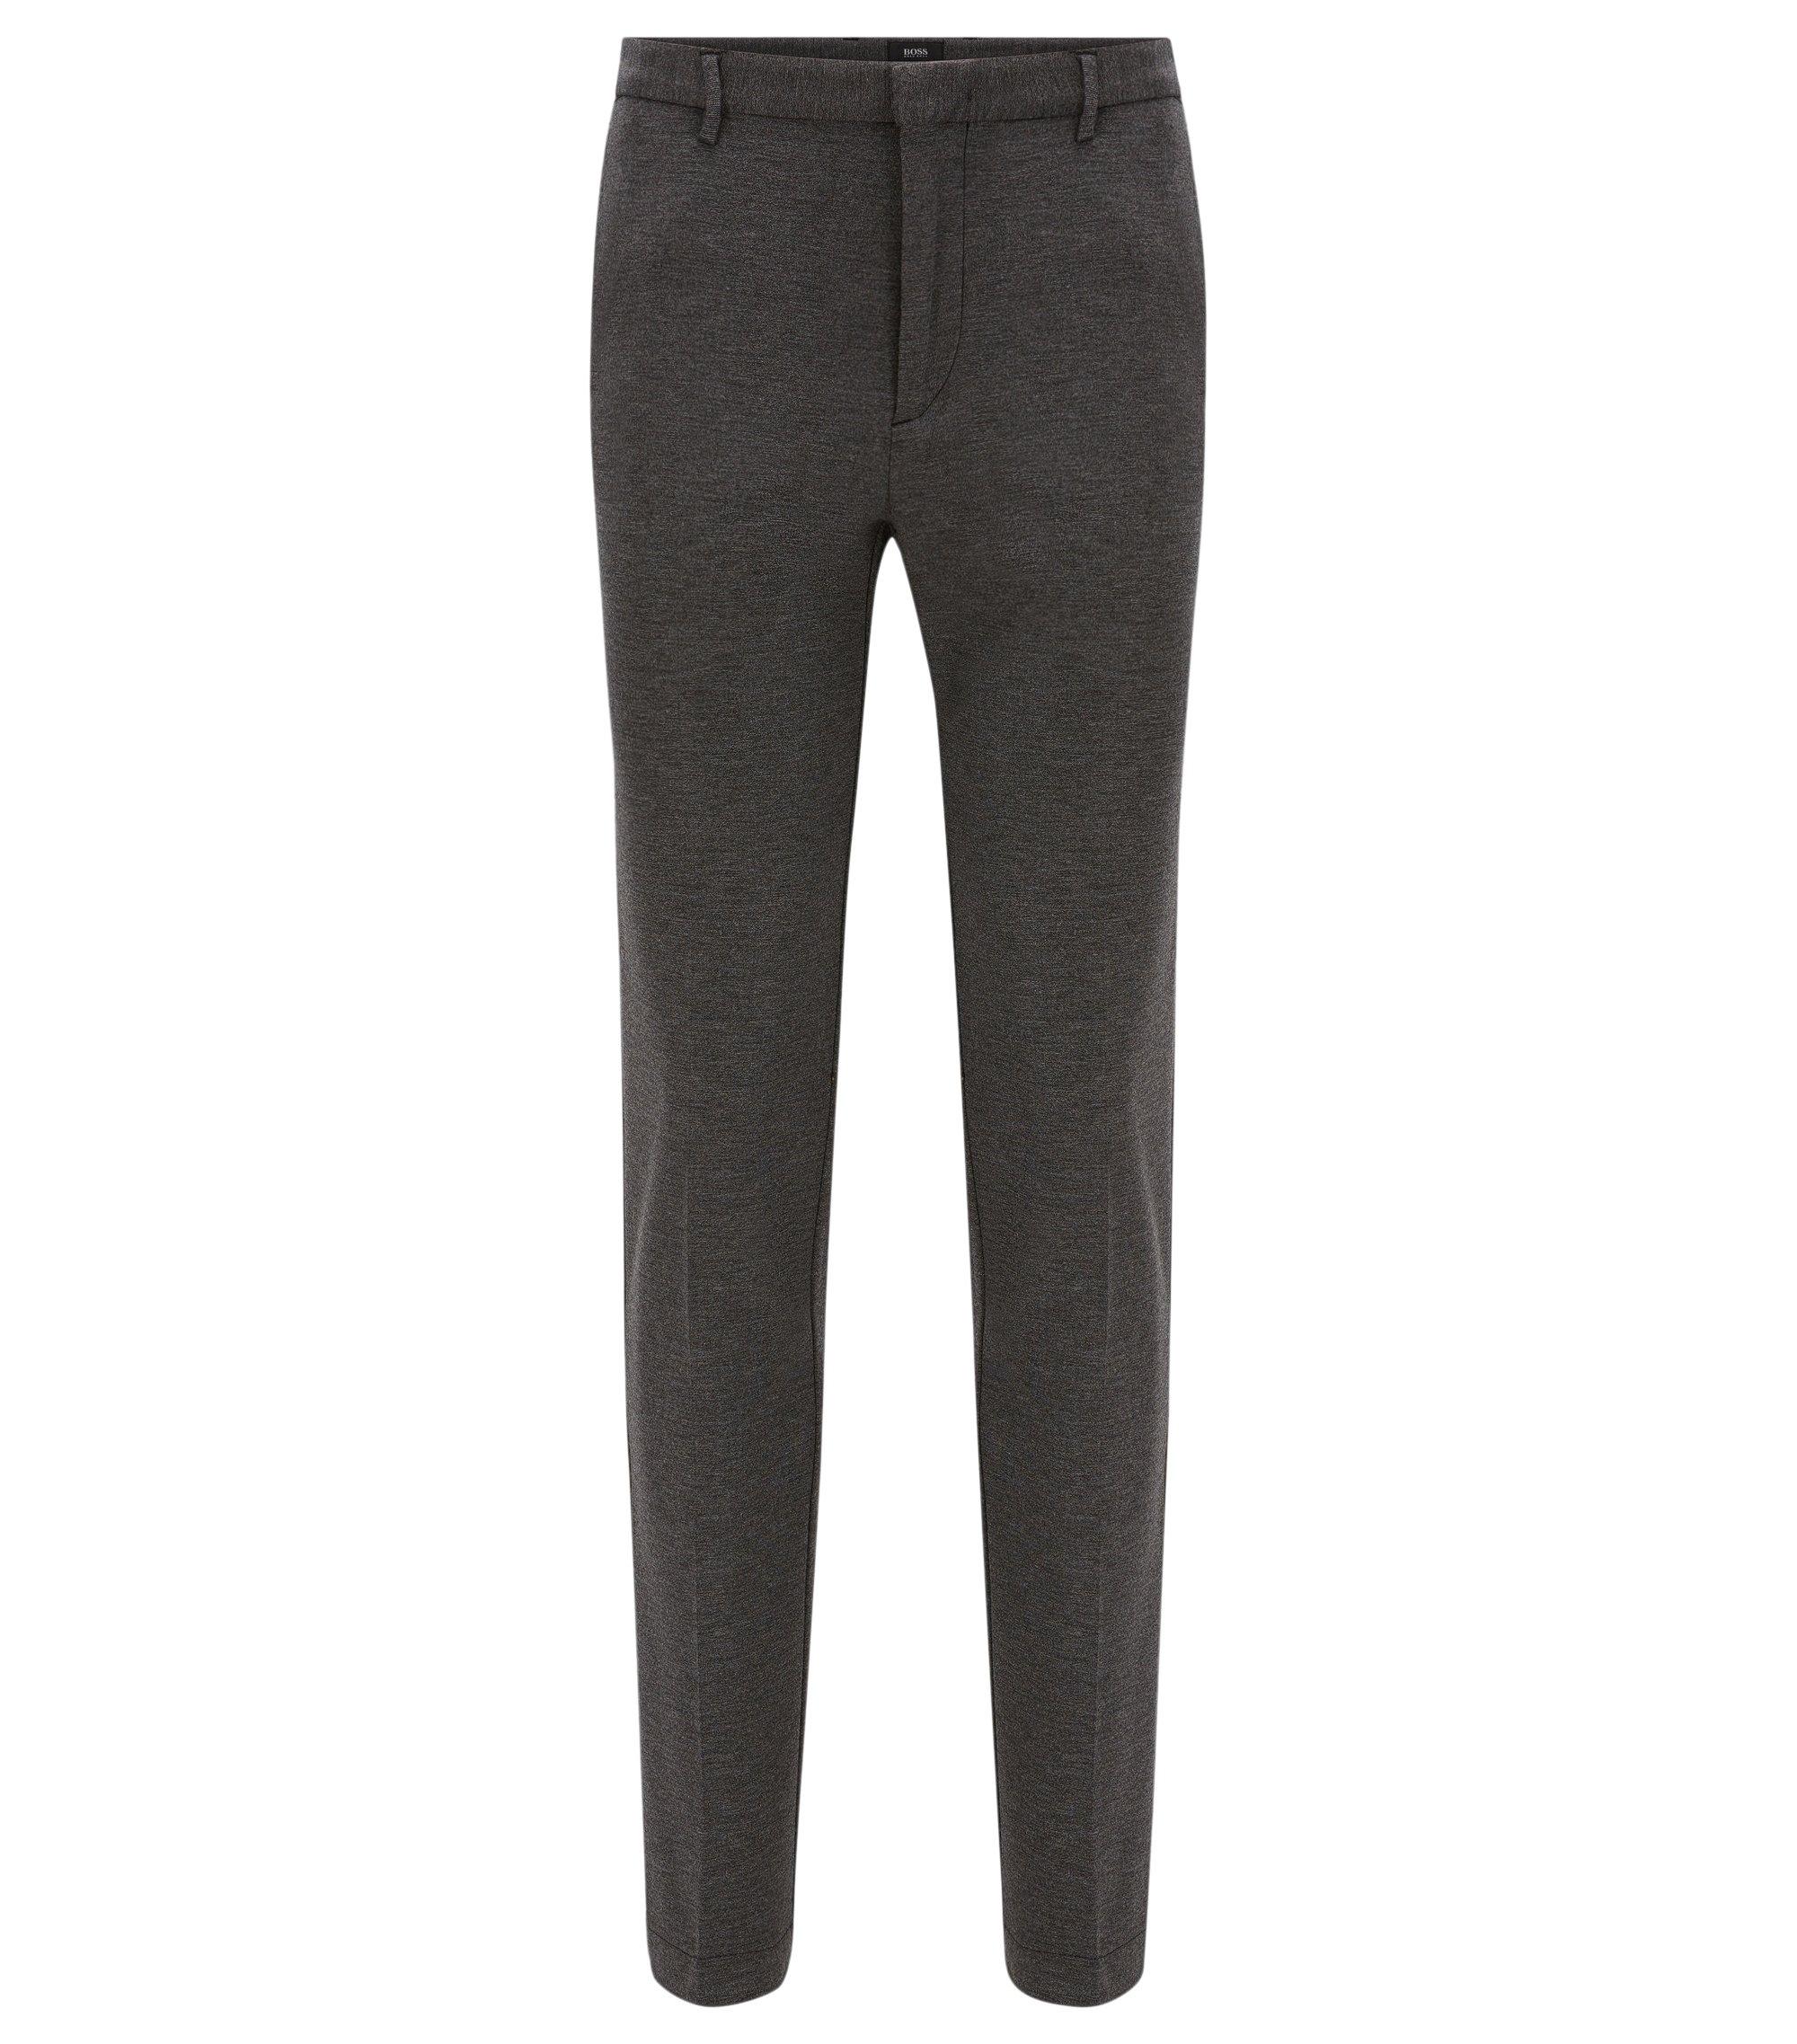 Stretch Melange Jersey Pant, Slim FIt | Kaito W, Grey